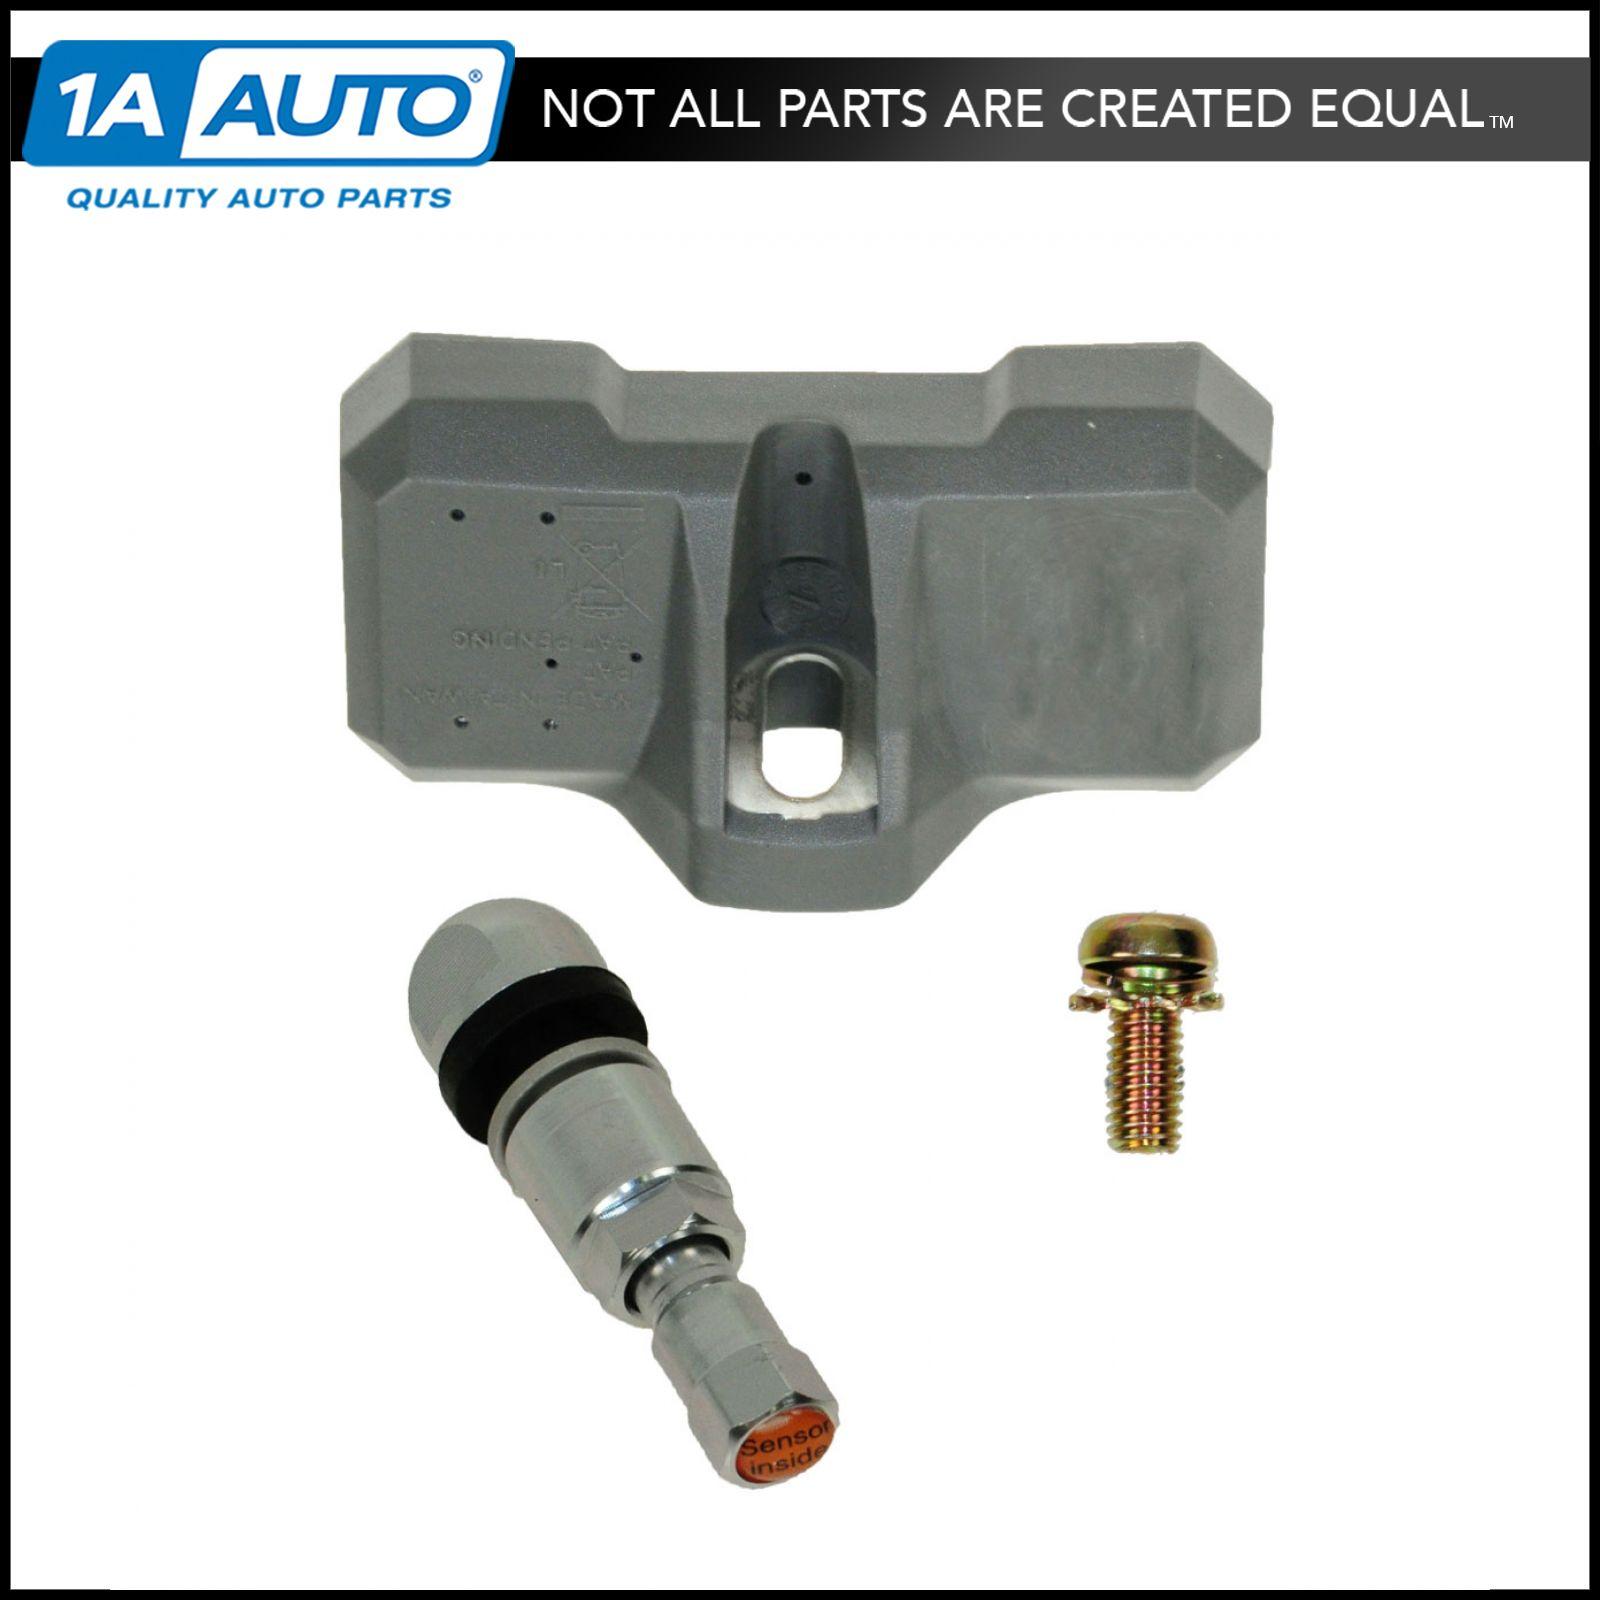 Nissan Rogue Tire Pressure Sensor: Tire Pressure Monitor Sensor System Assembly TPMS